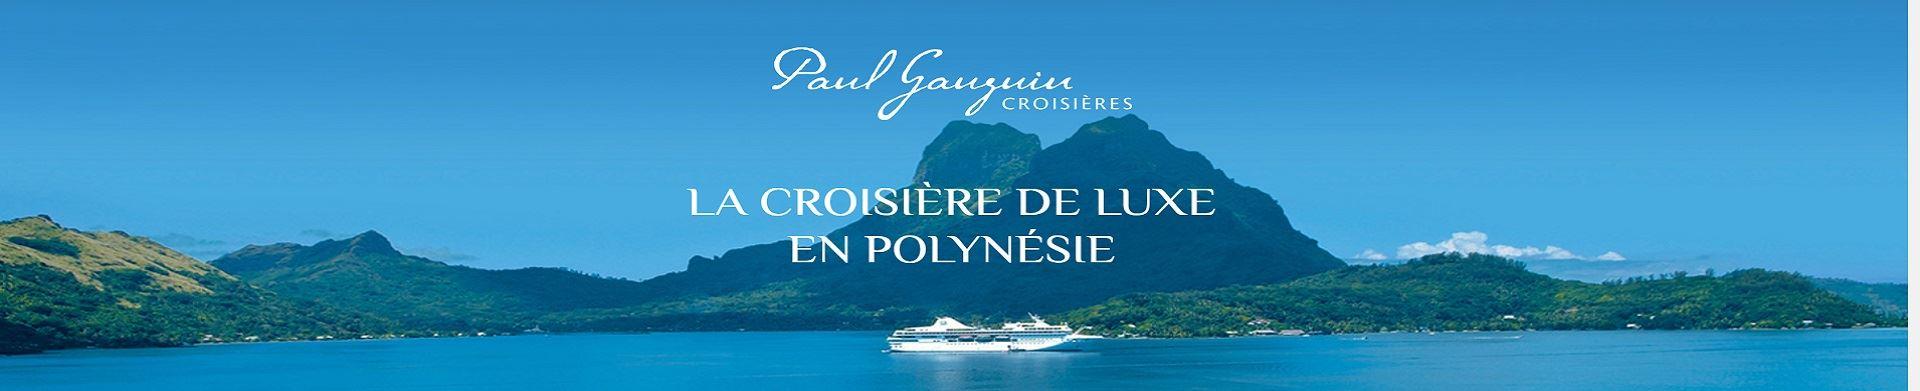 Paul Gauguin croisières de luxe en Polynésie